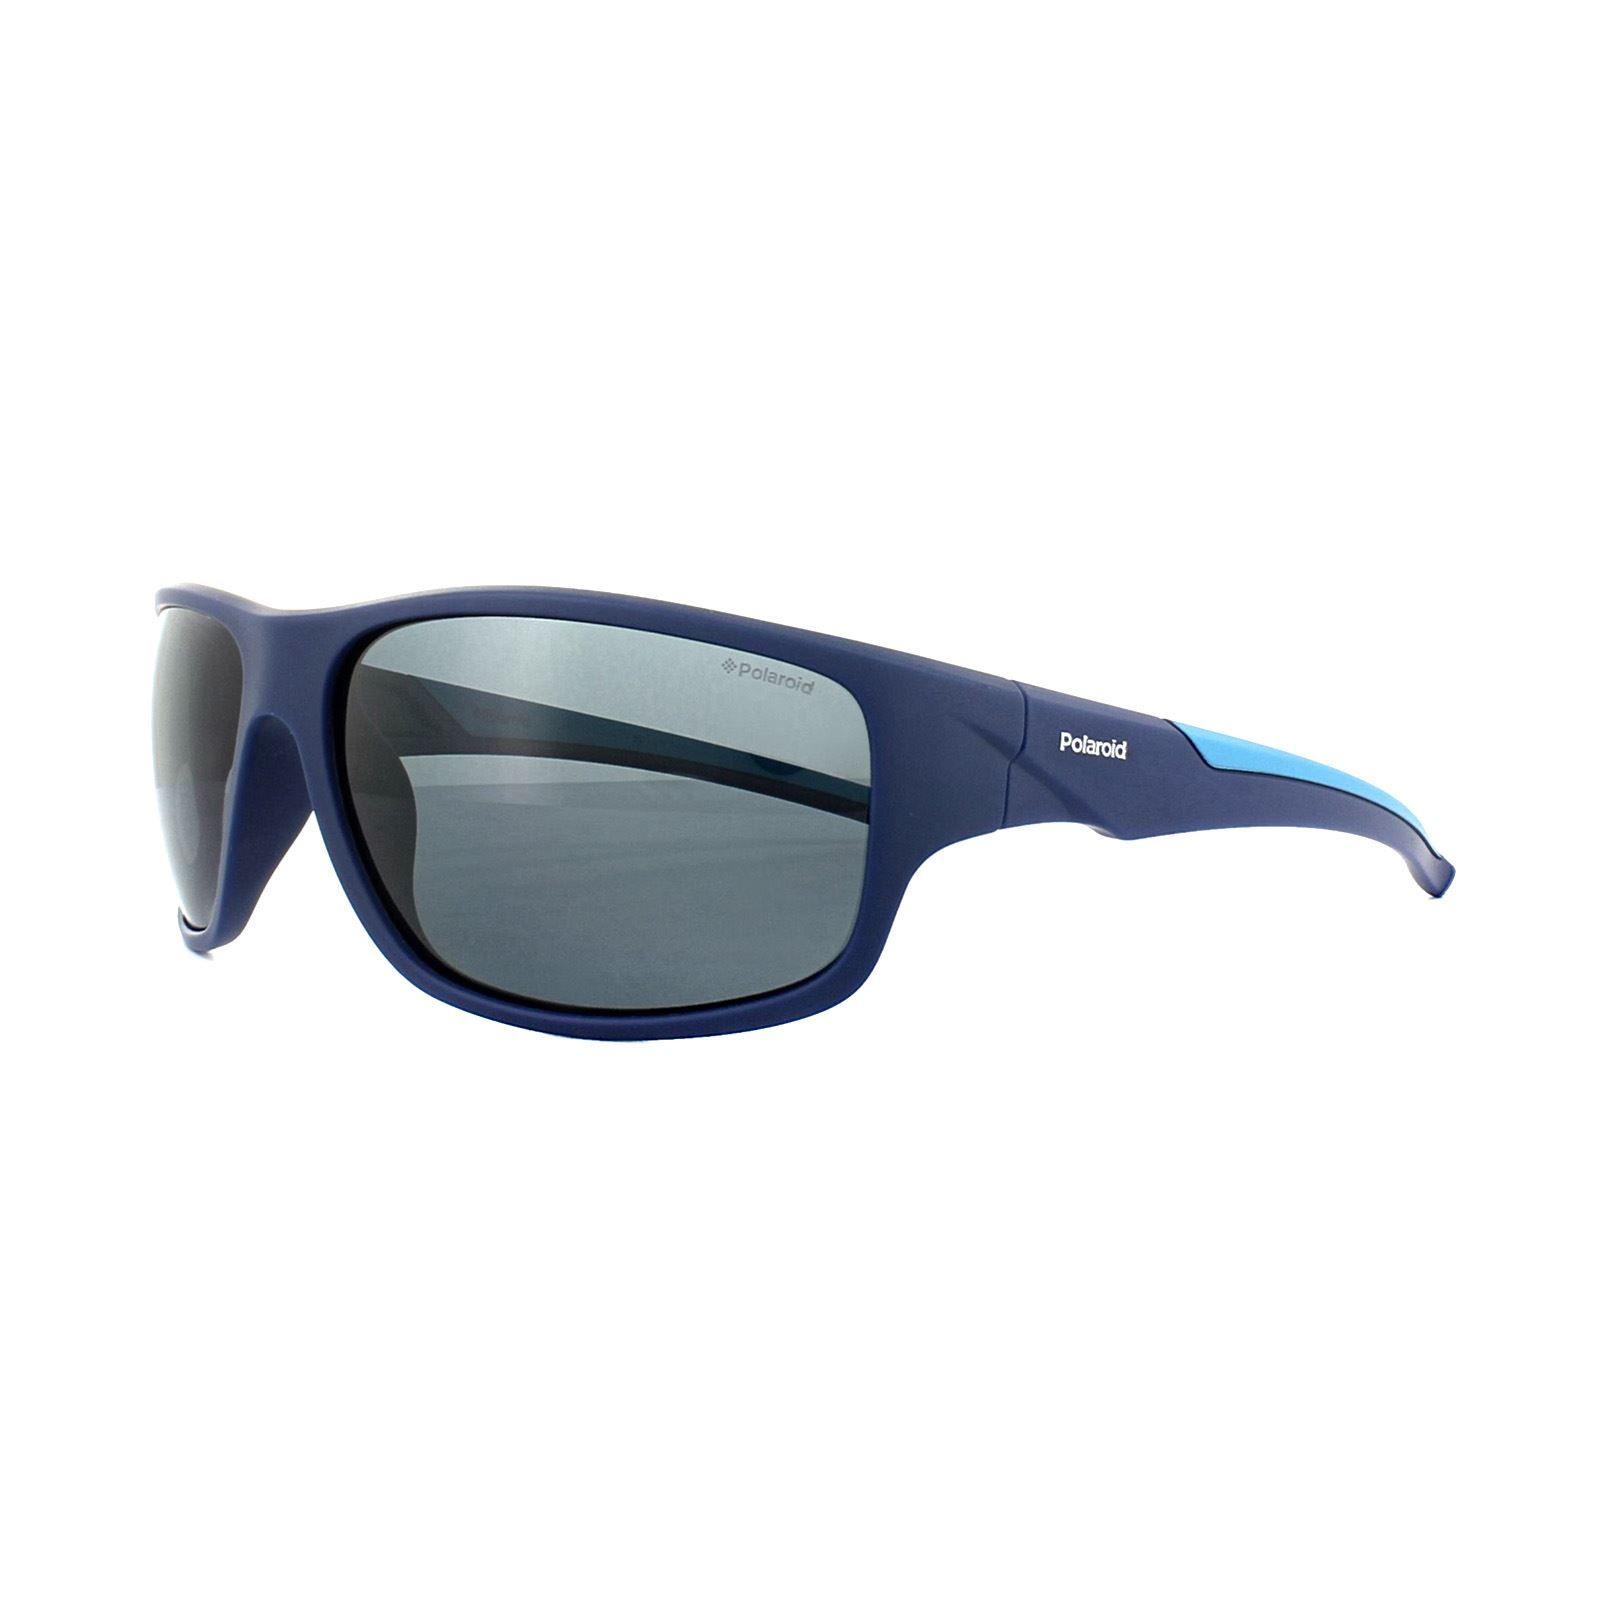 Polaroid Sport Sunglasses 7010/S ZX9 C3 Blue Azure Grey Polarized